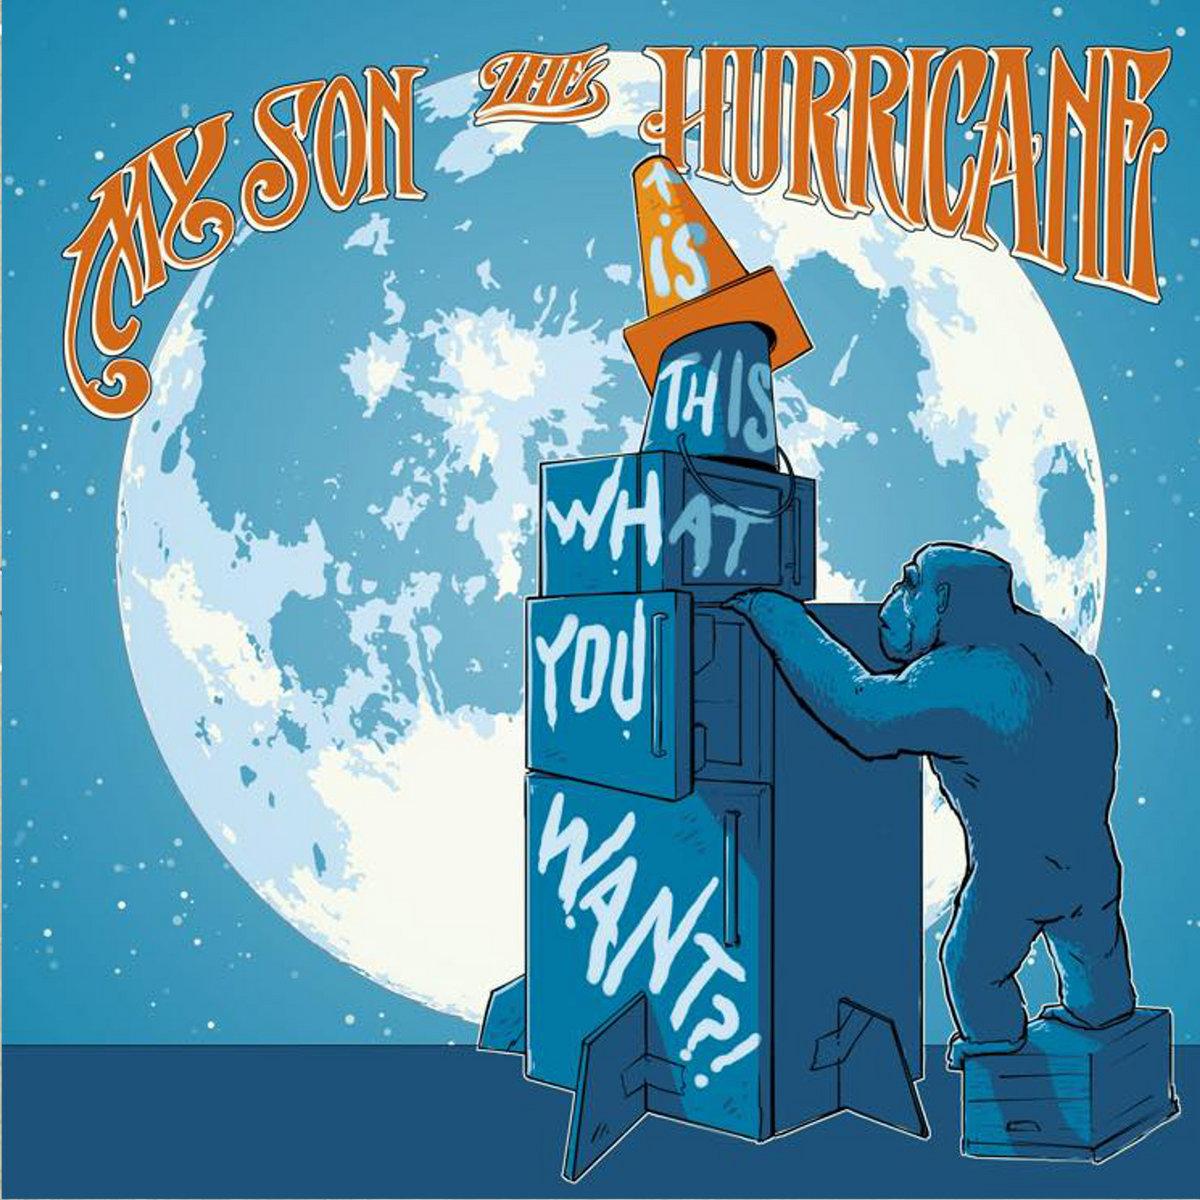 Birthday Cake w Sammi Morelli My Son The Hurricane